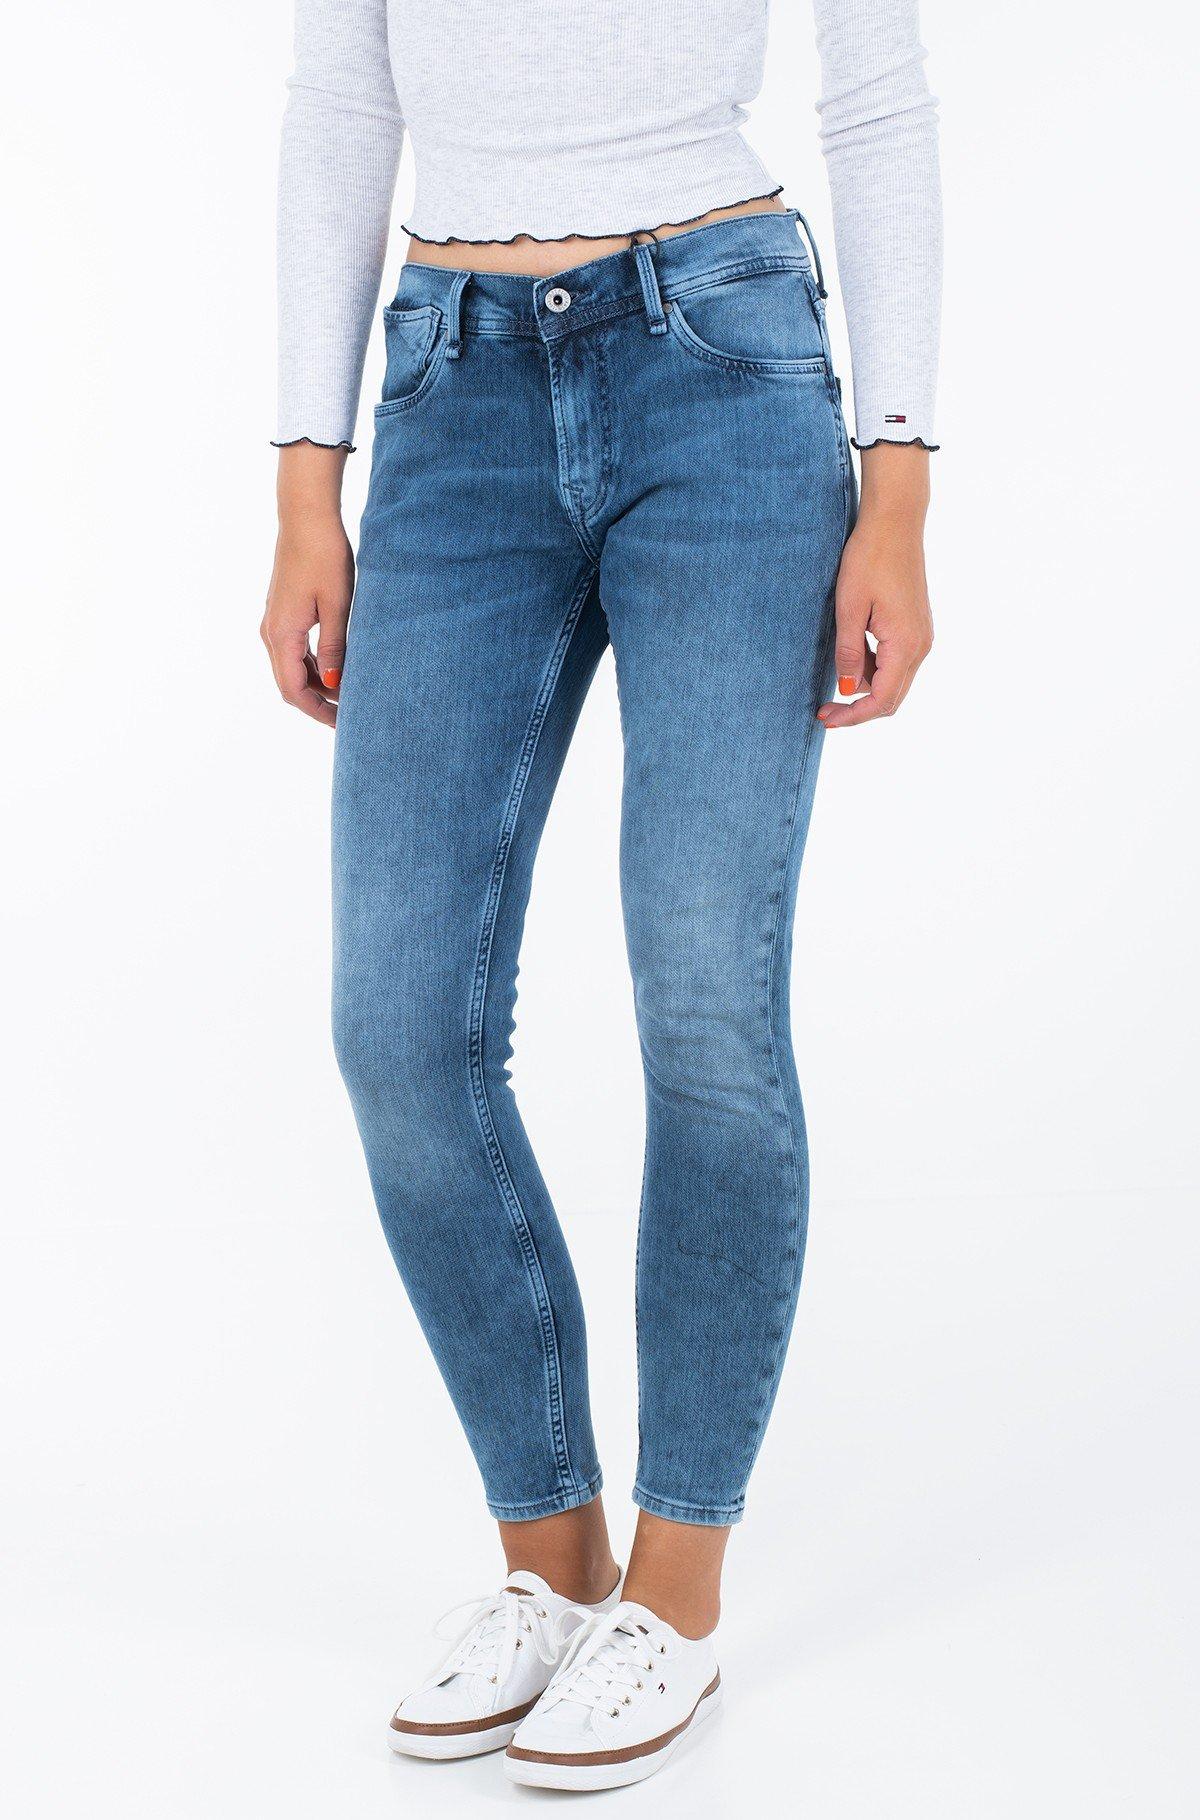 Jeans JOEY/PL201090GR2-full-1